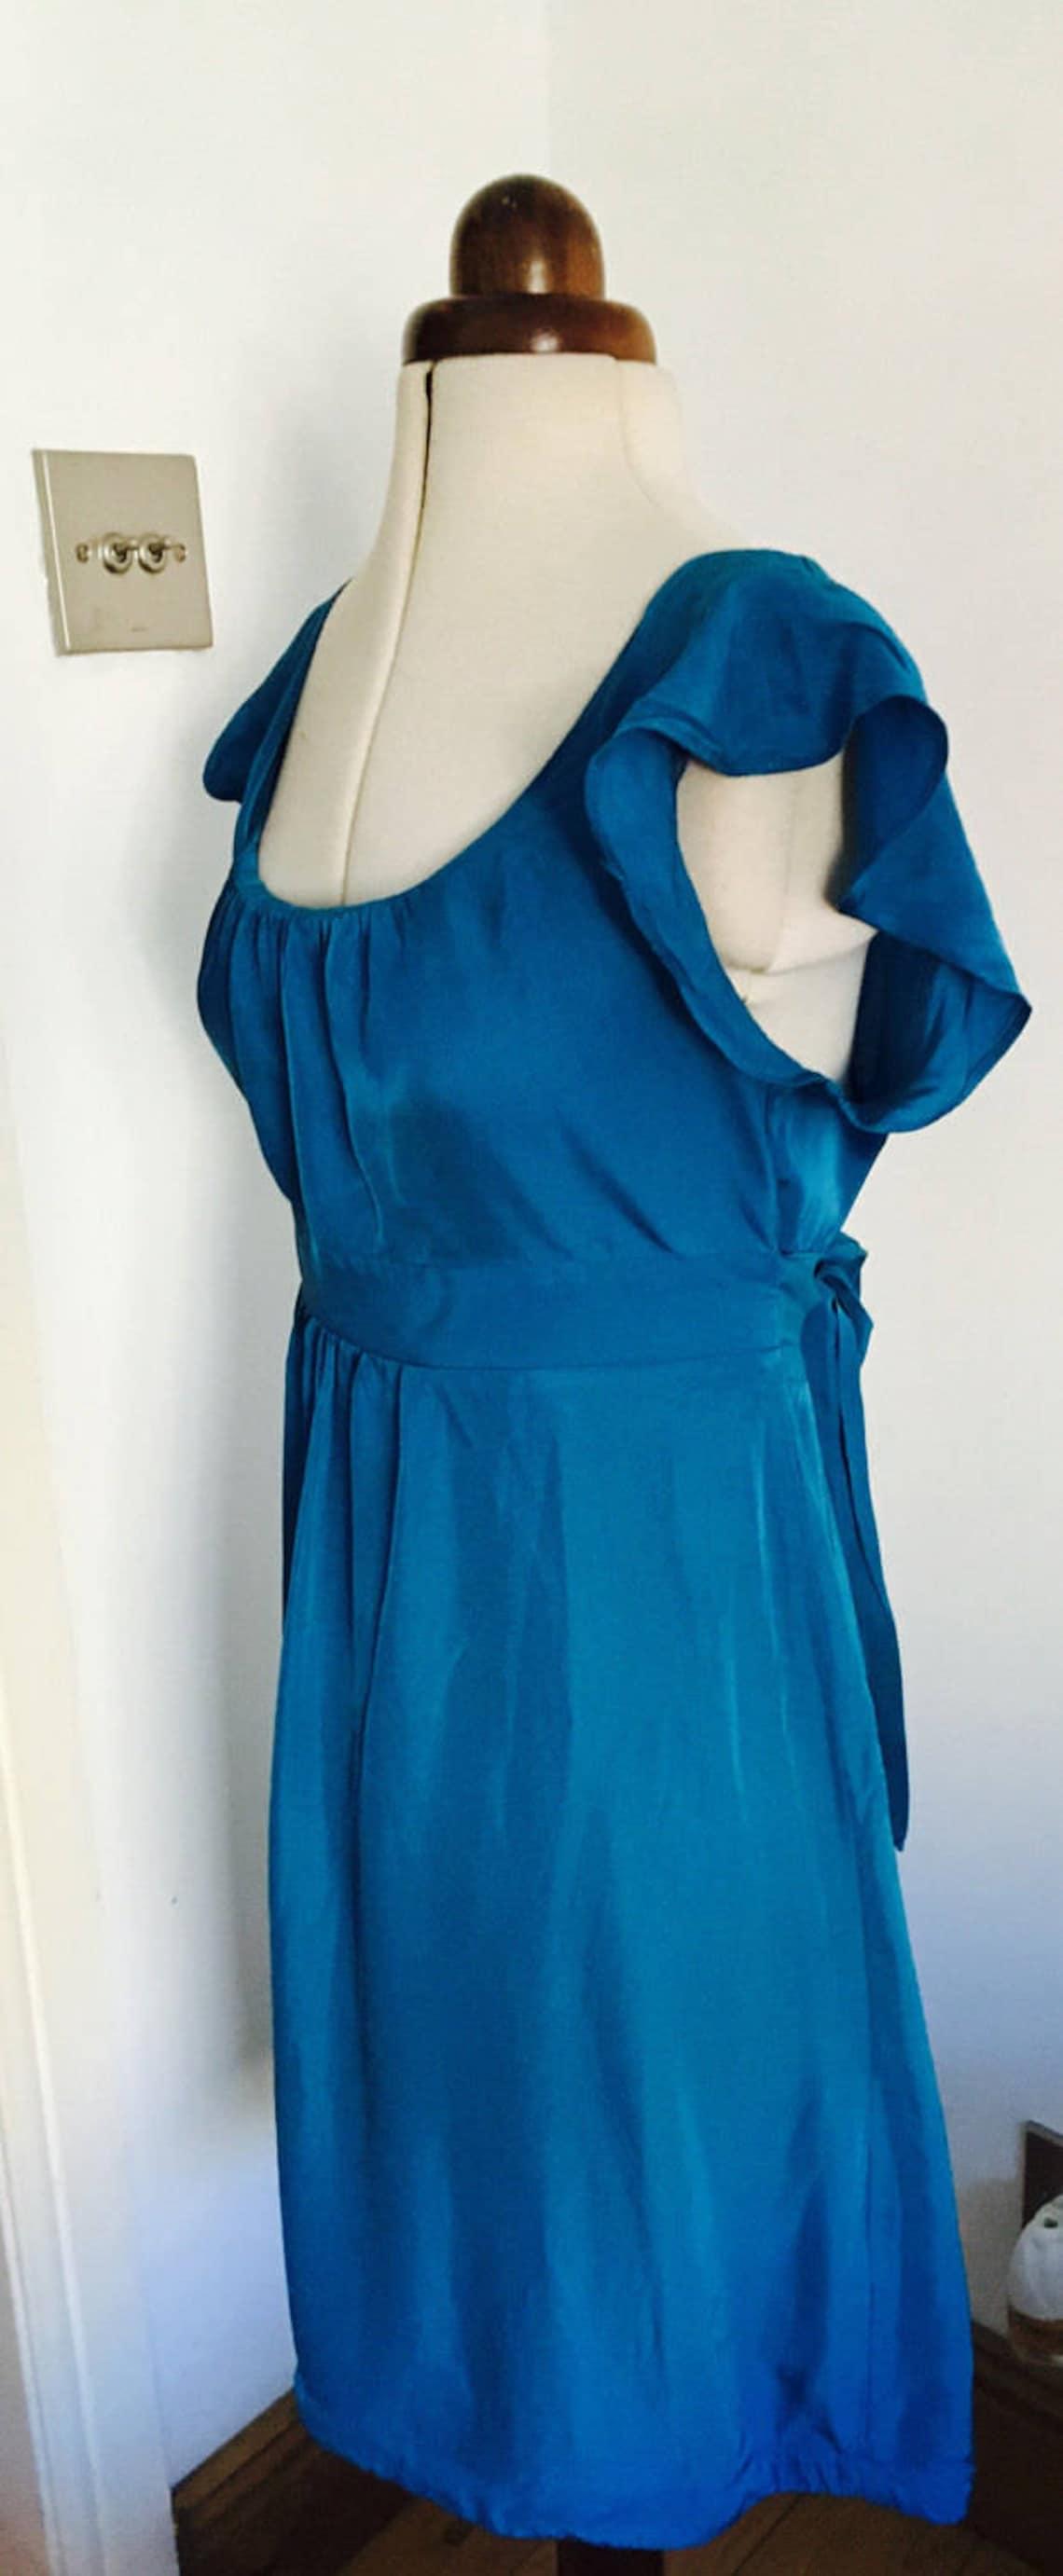 1940's Vintage Tea Dress 40's Dress War Bride Dress